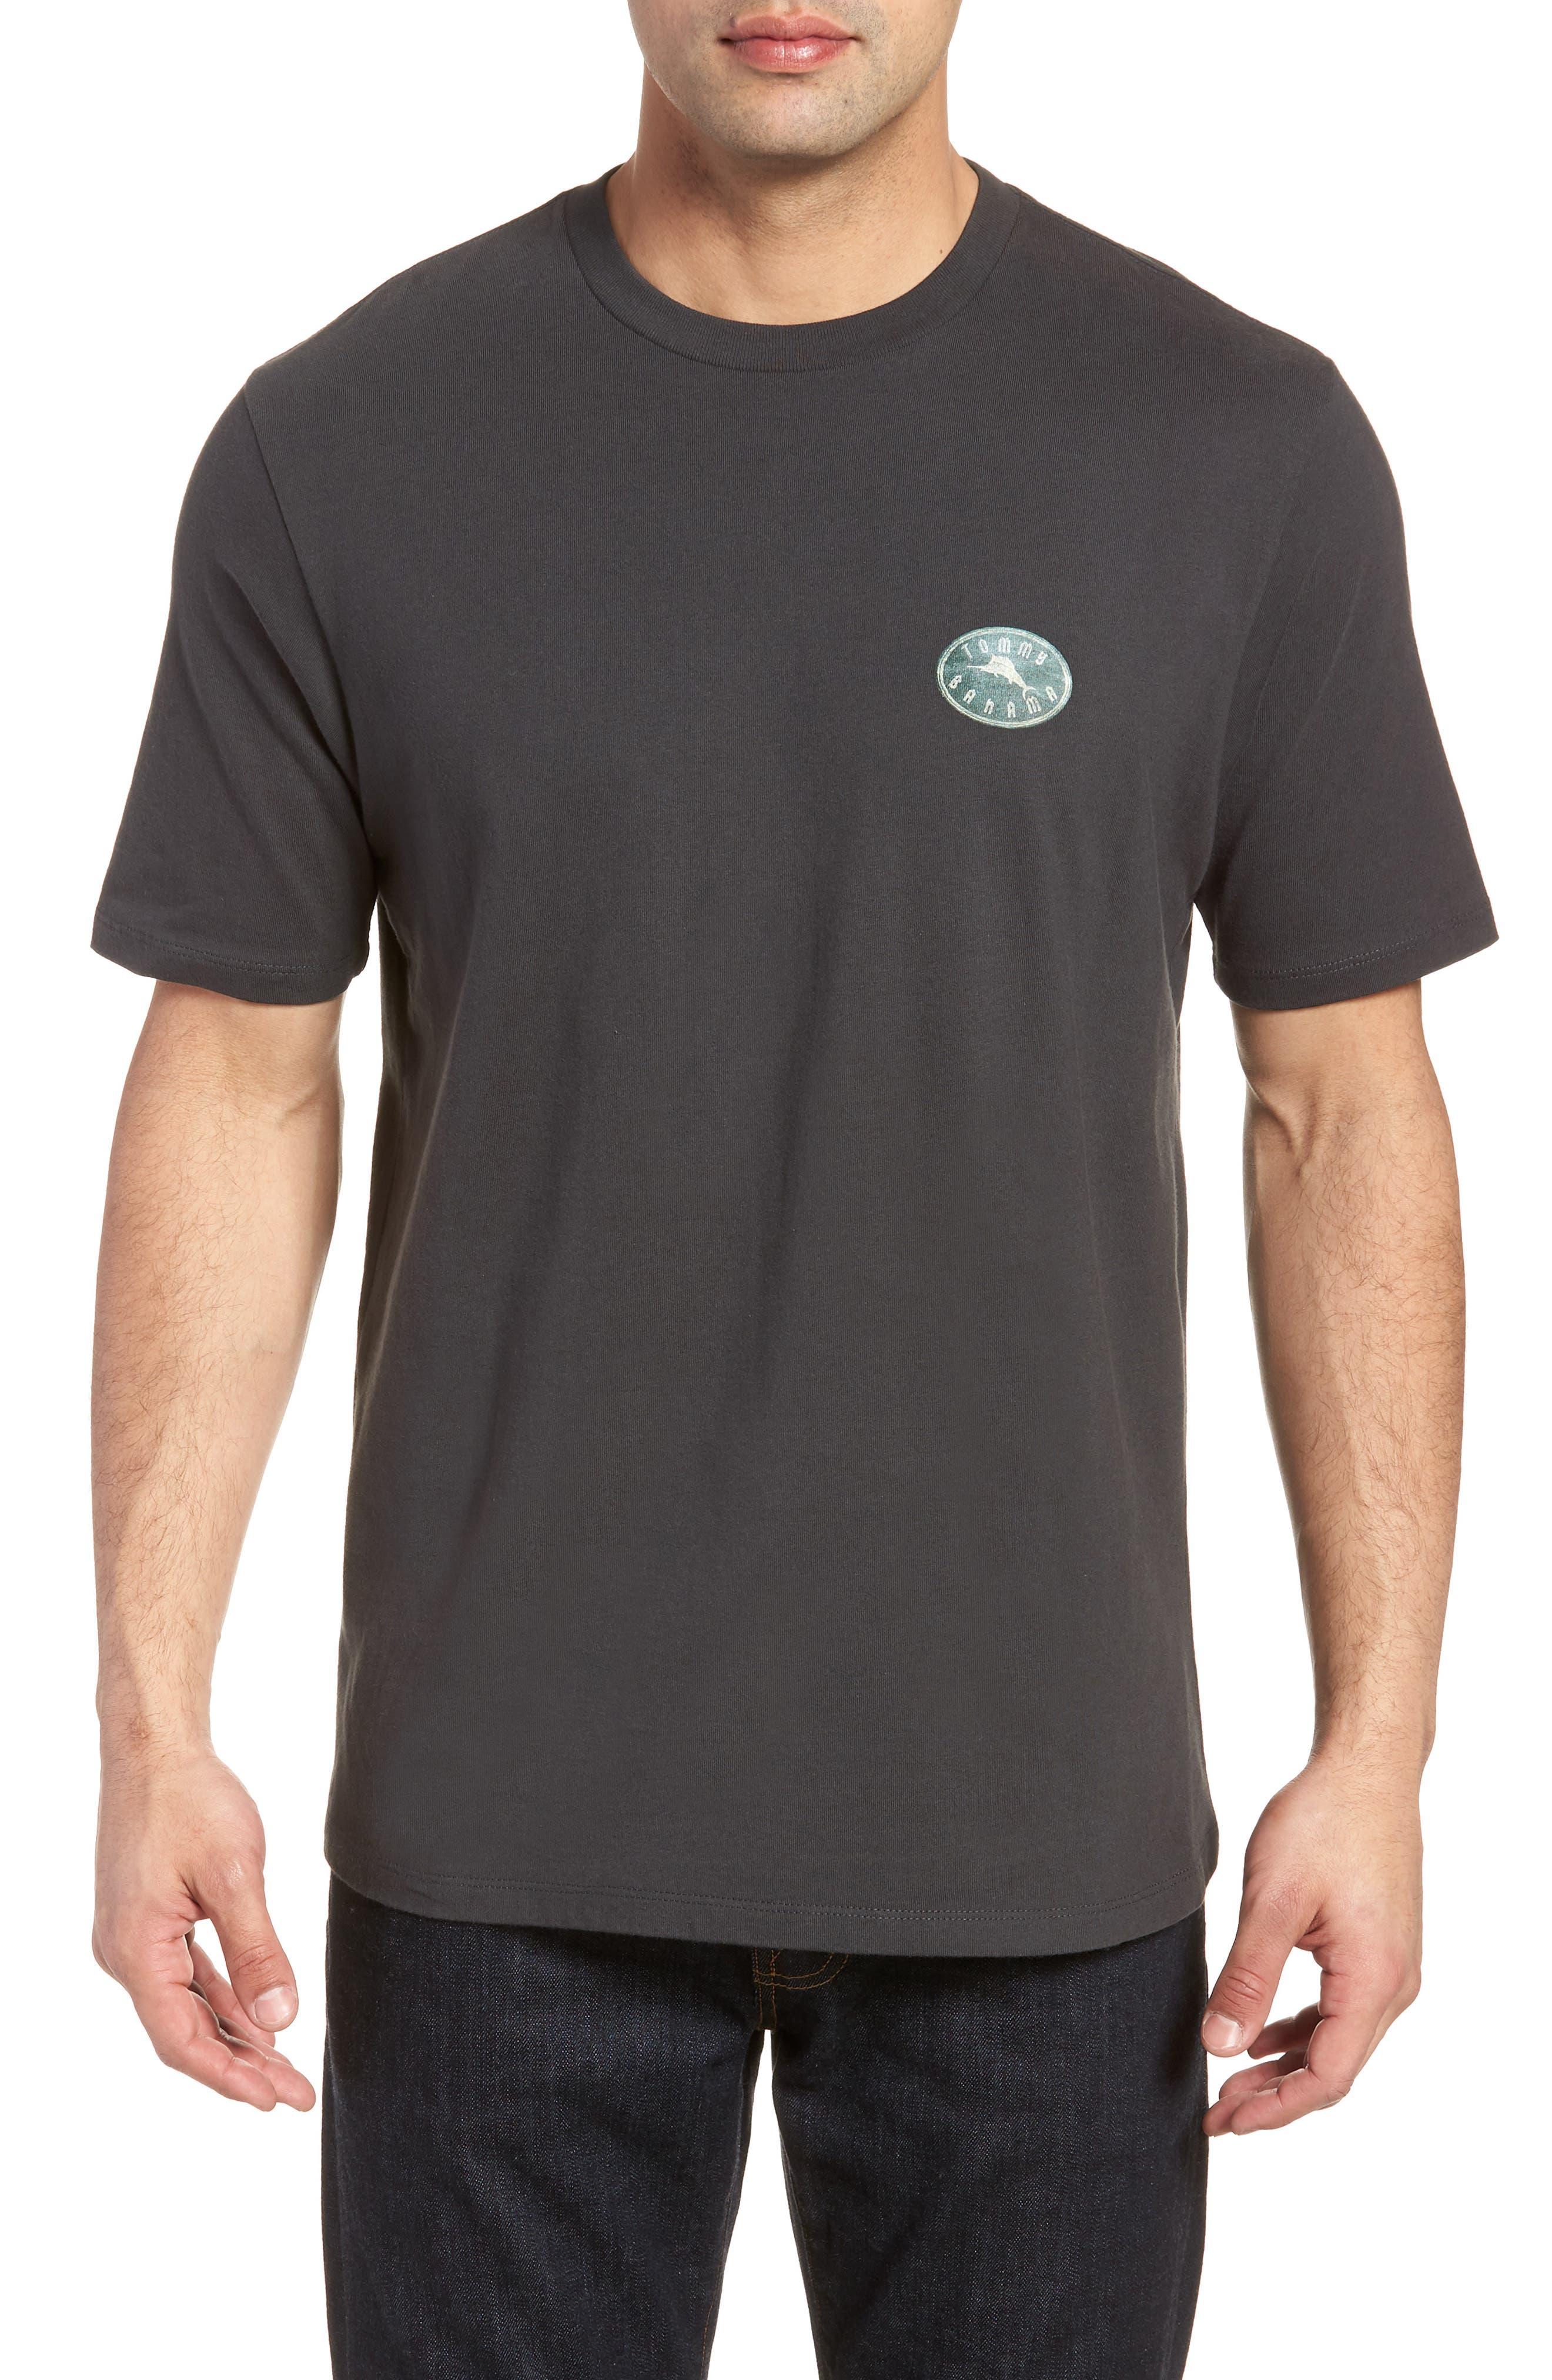 Tommy Bahama Chalk & Roll T-Shirt